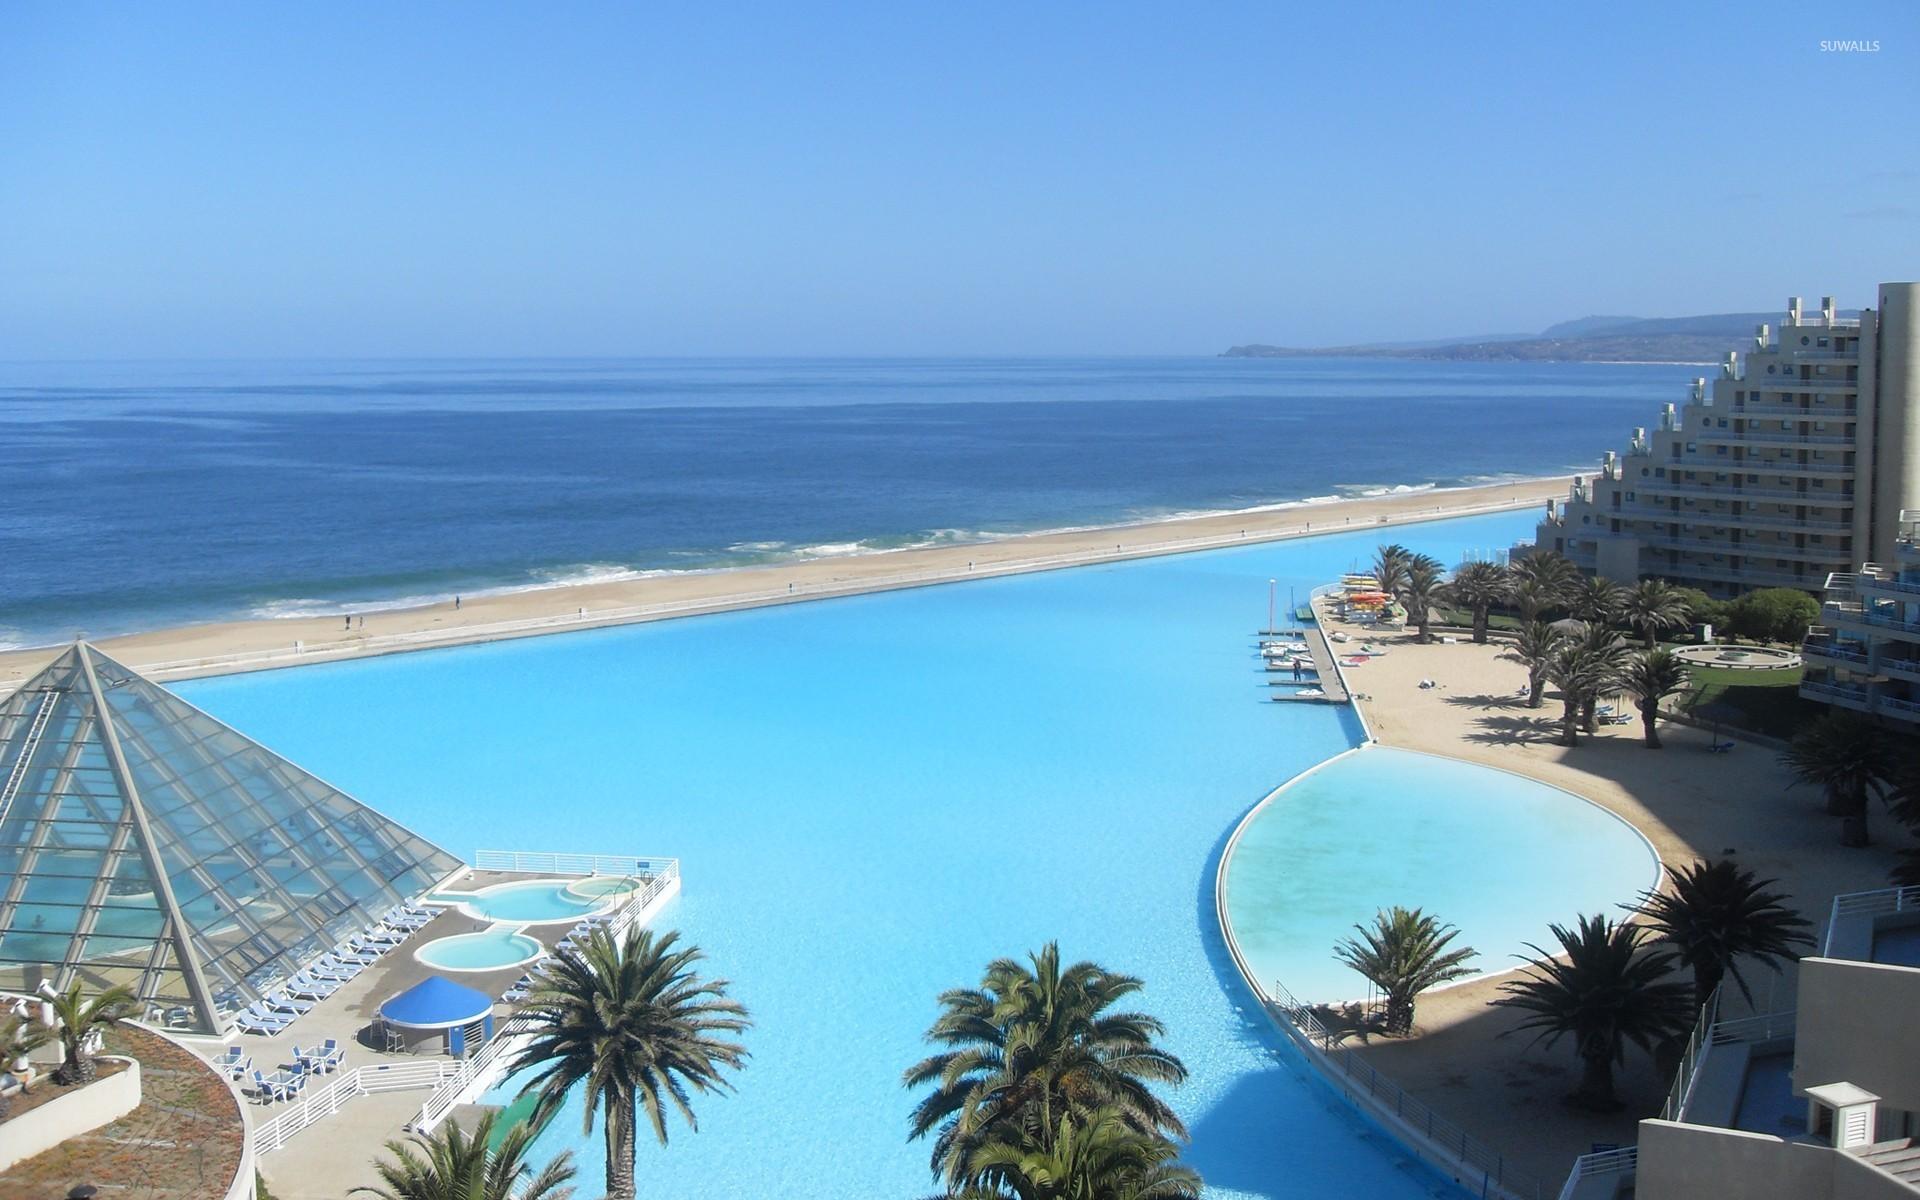 San alfonso del mar wallpaper beach wallpapers 10444 for Modelos de piscinas en chile